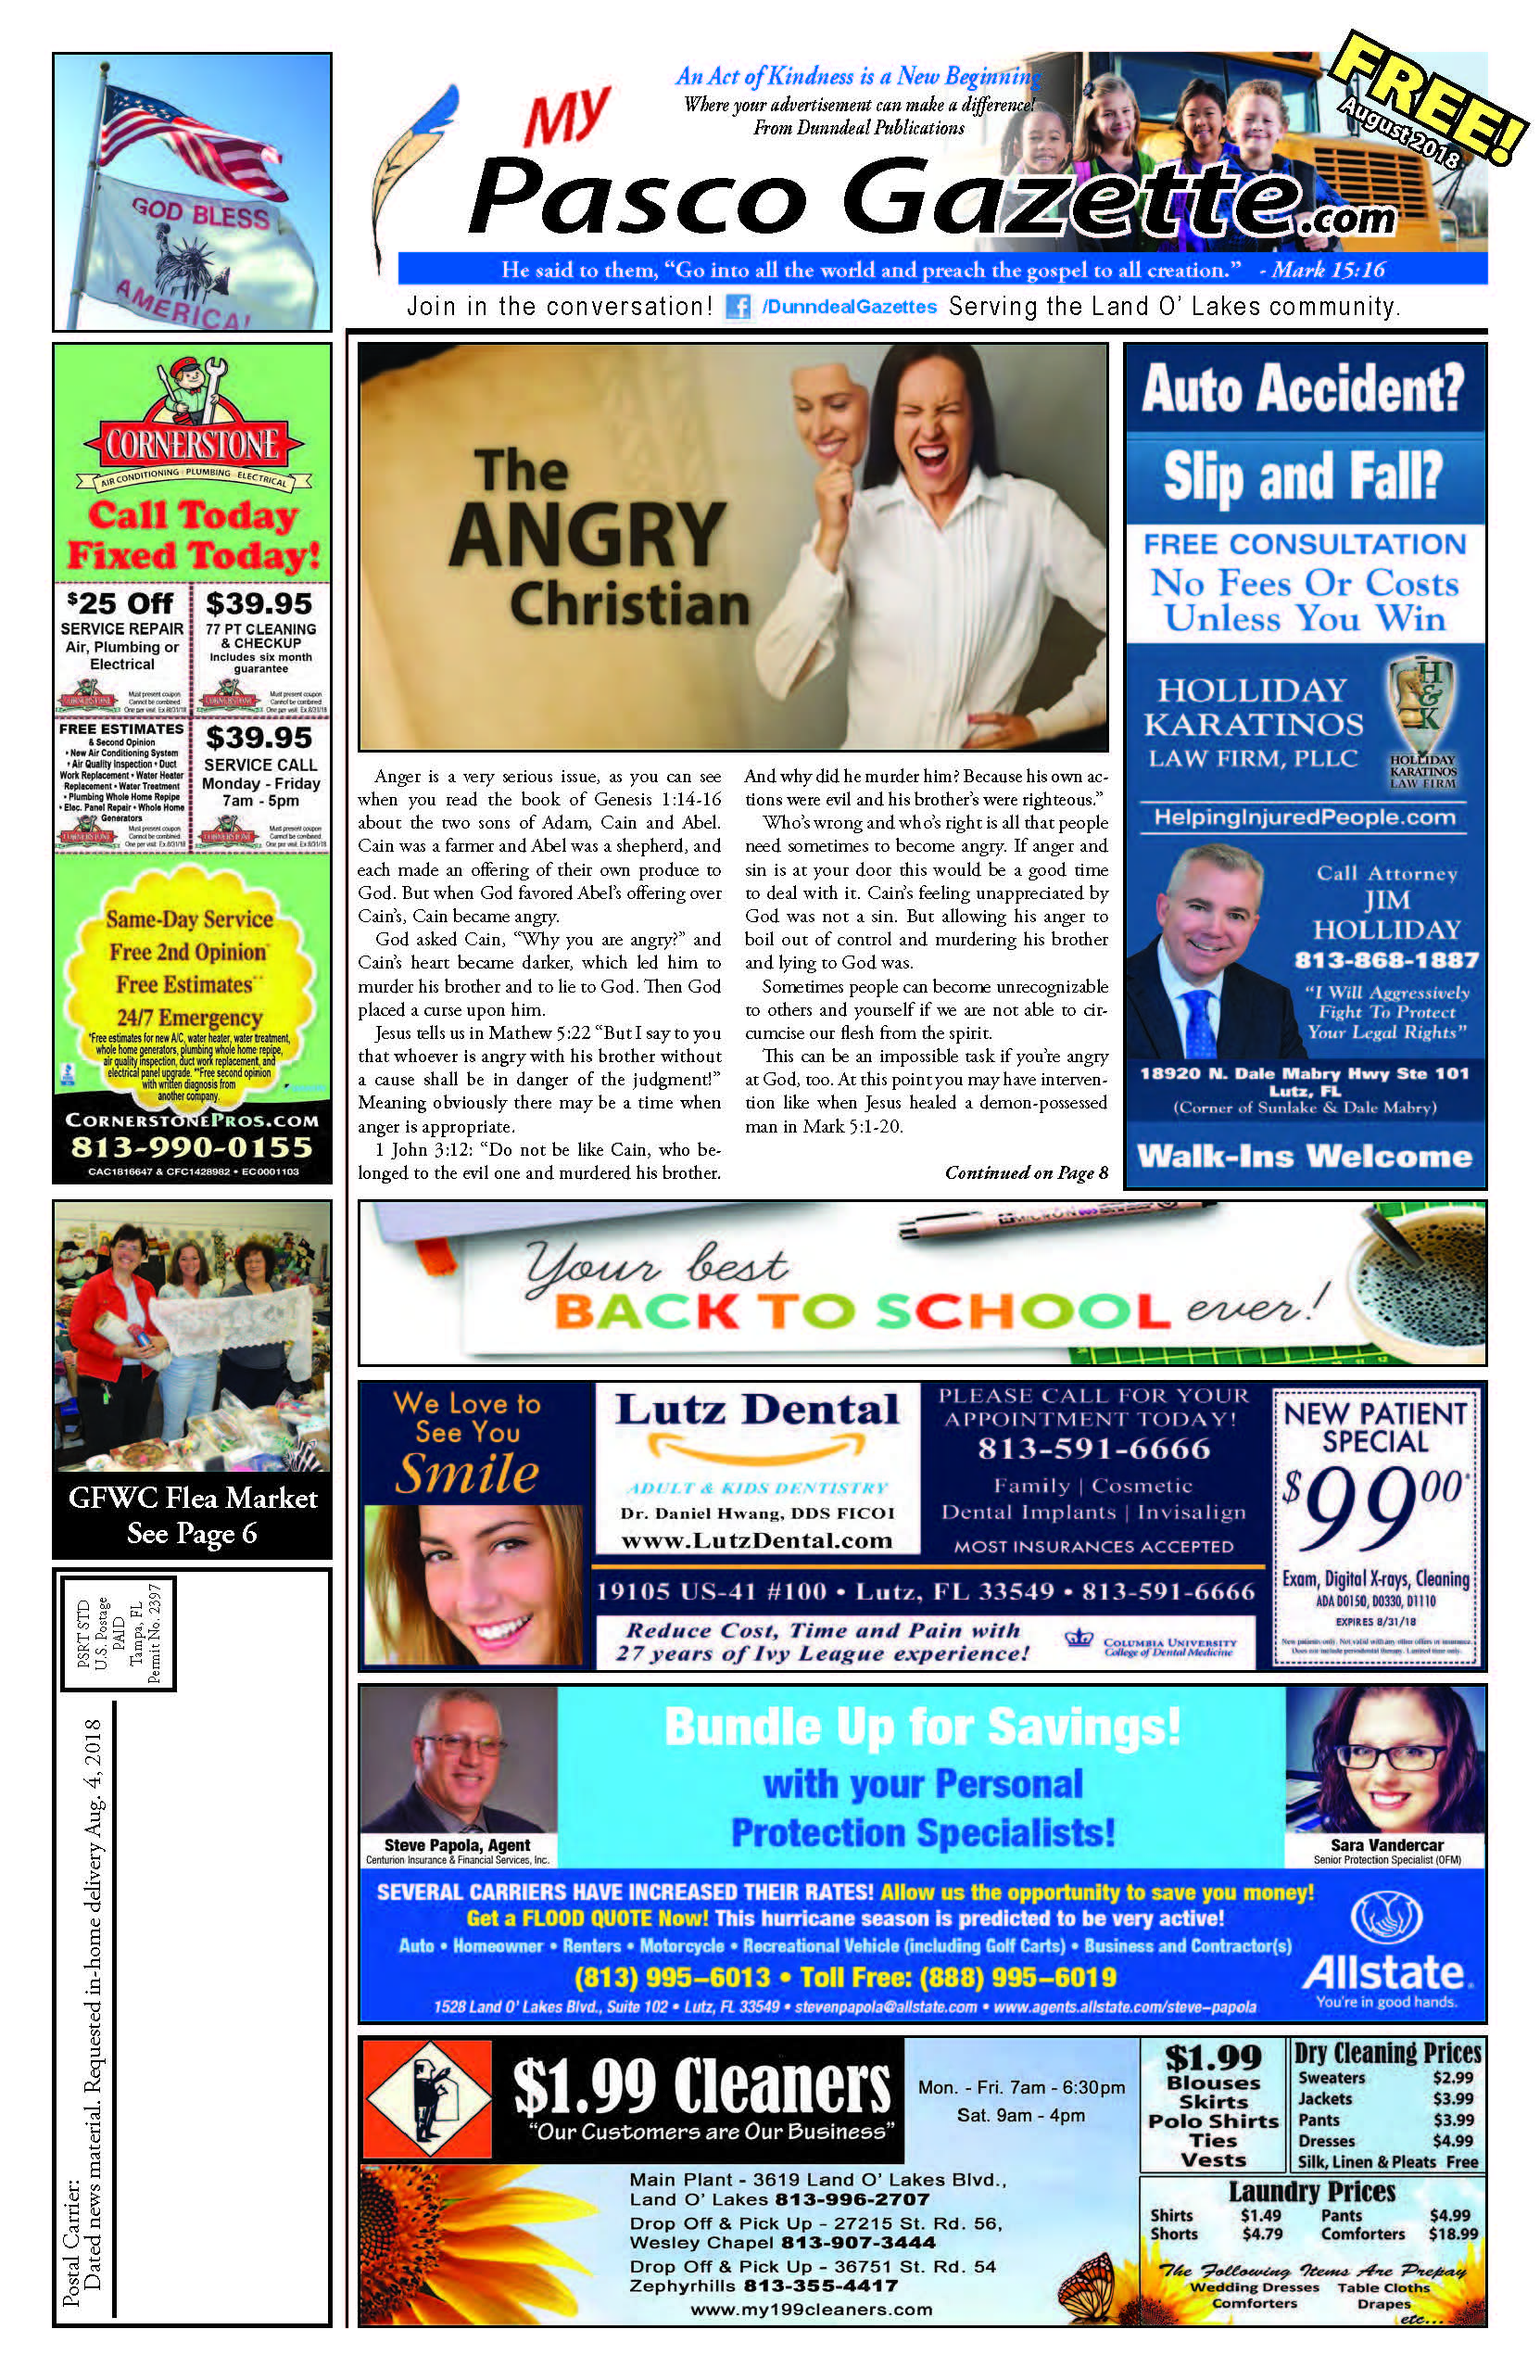 Pasco-Gazette-August-2018_Page_01.jpg